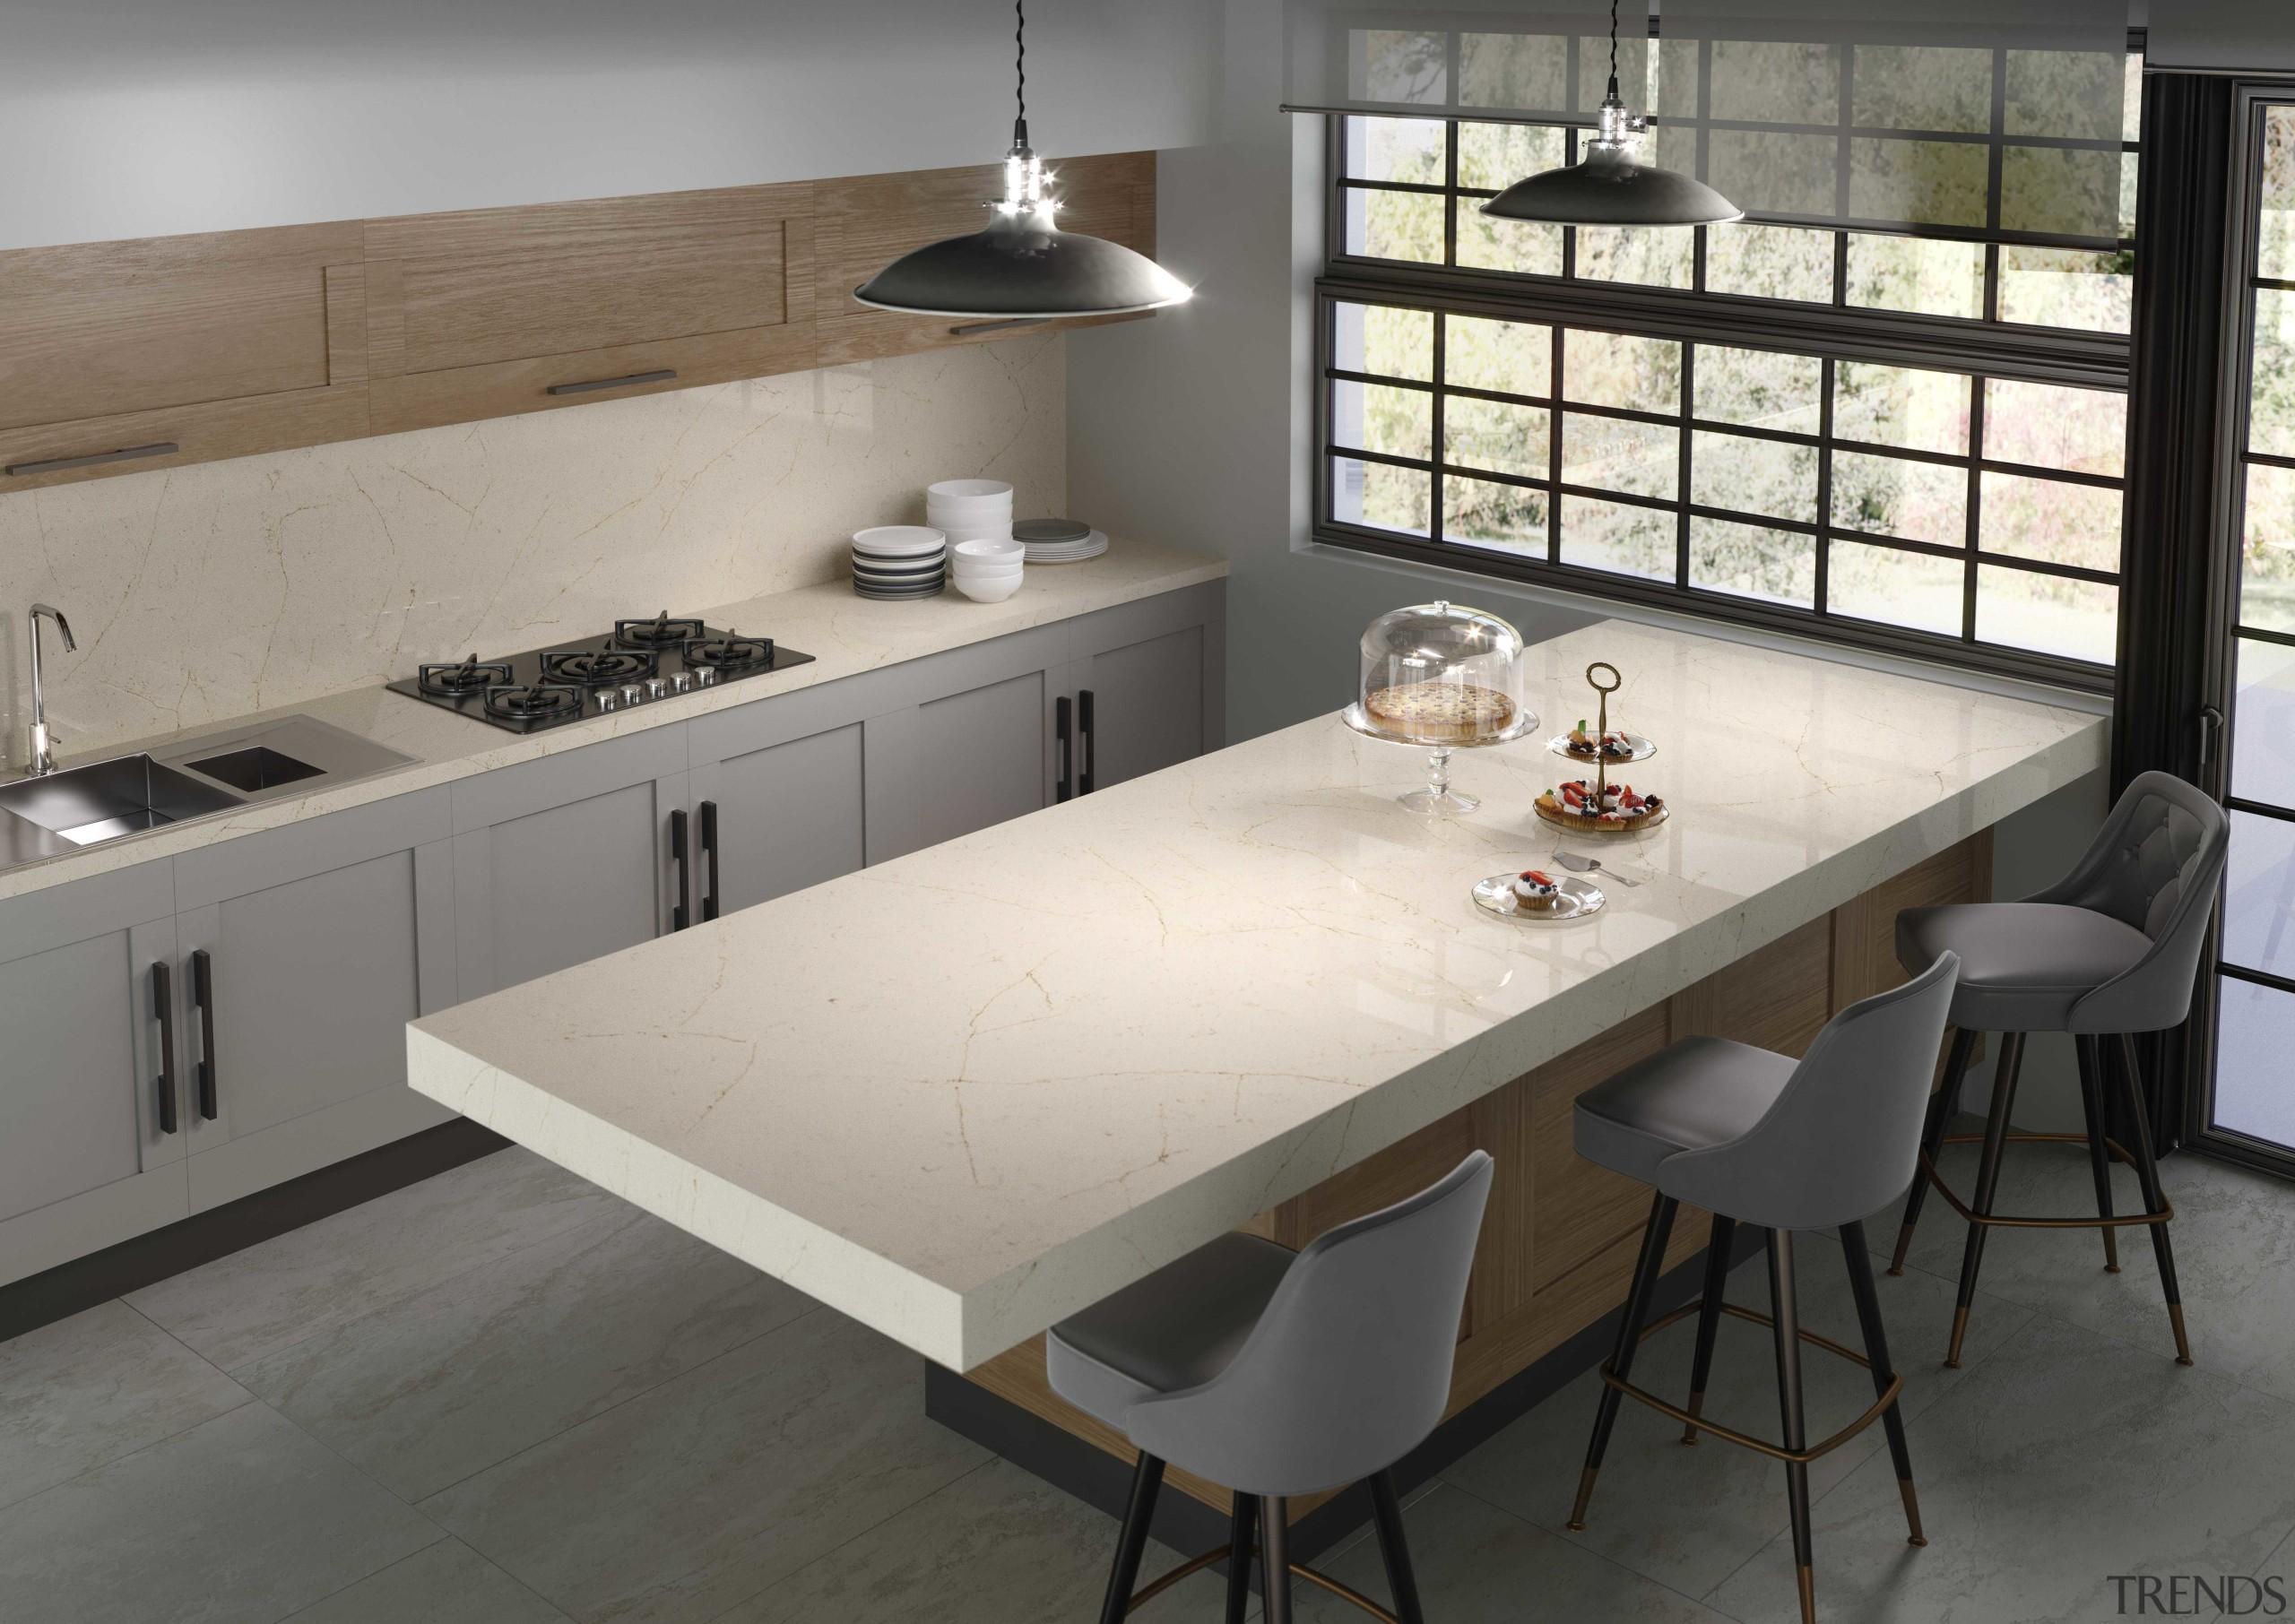 Silestone® Eternal Marfil Encimera Cocina 2 1 - countertop, cuisine classique, floor, furniture, interior design, kitchen, table, gray, black